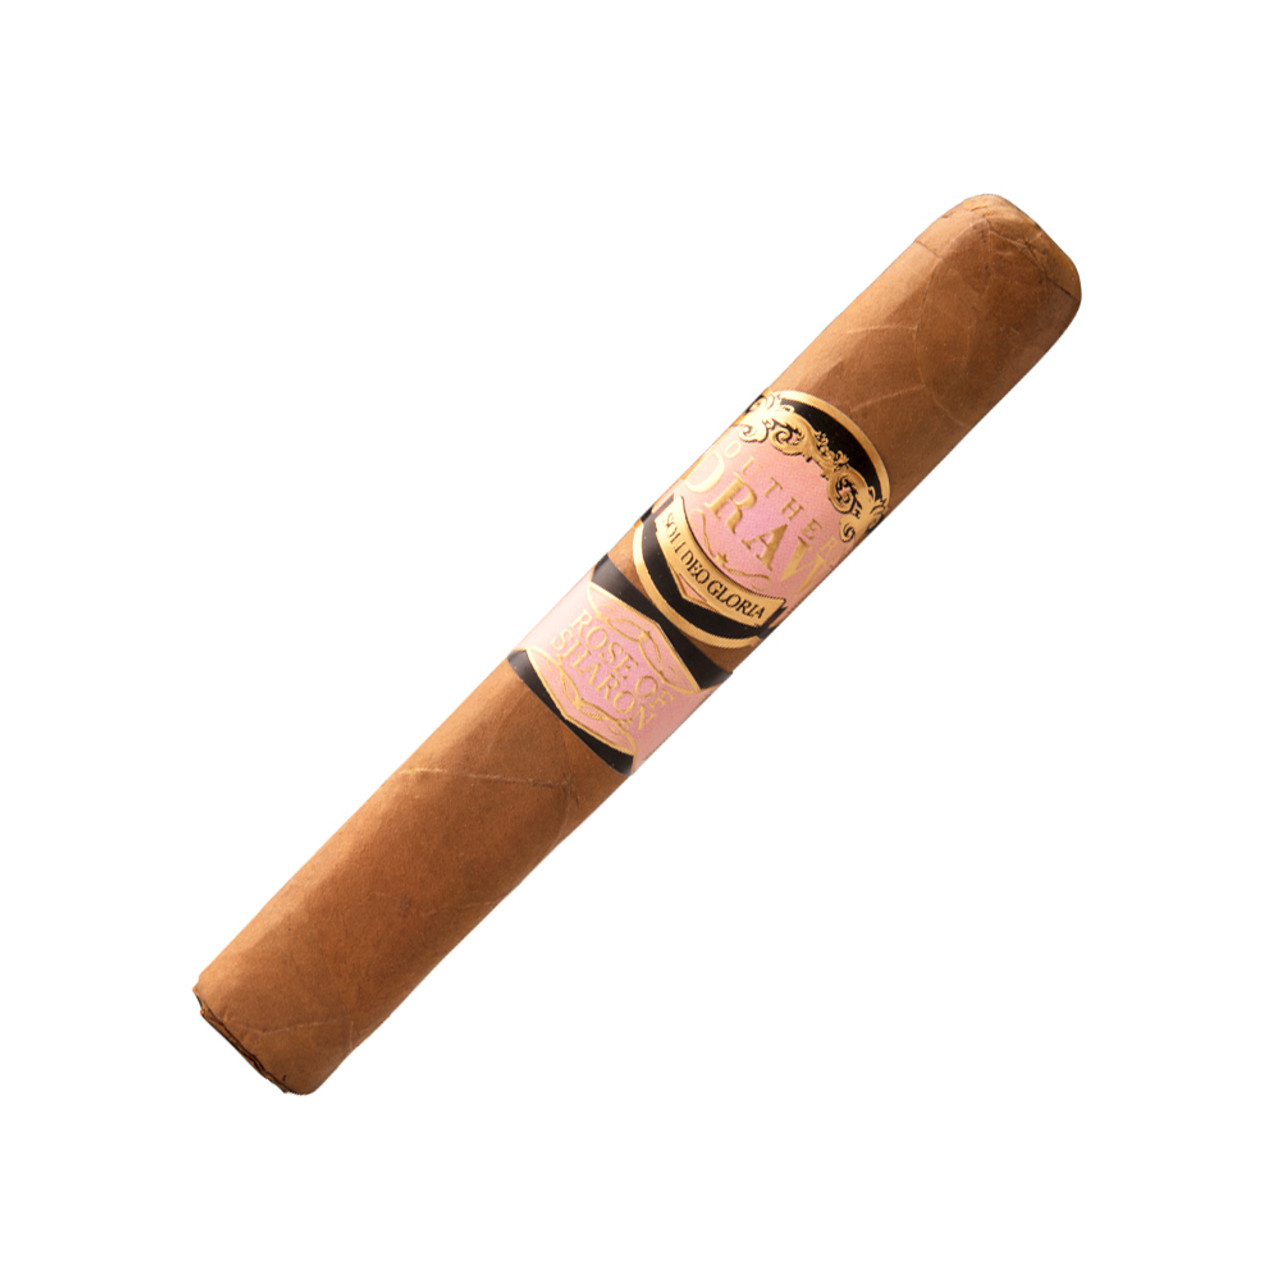 Southern Draw Rose Of Sharon Robusto Cigars - 5 x 54 (Box of 20)